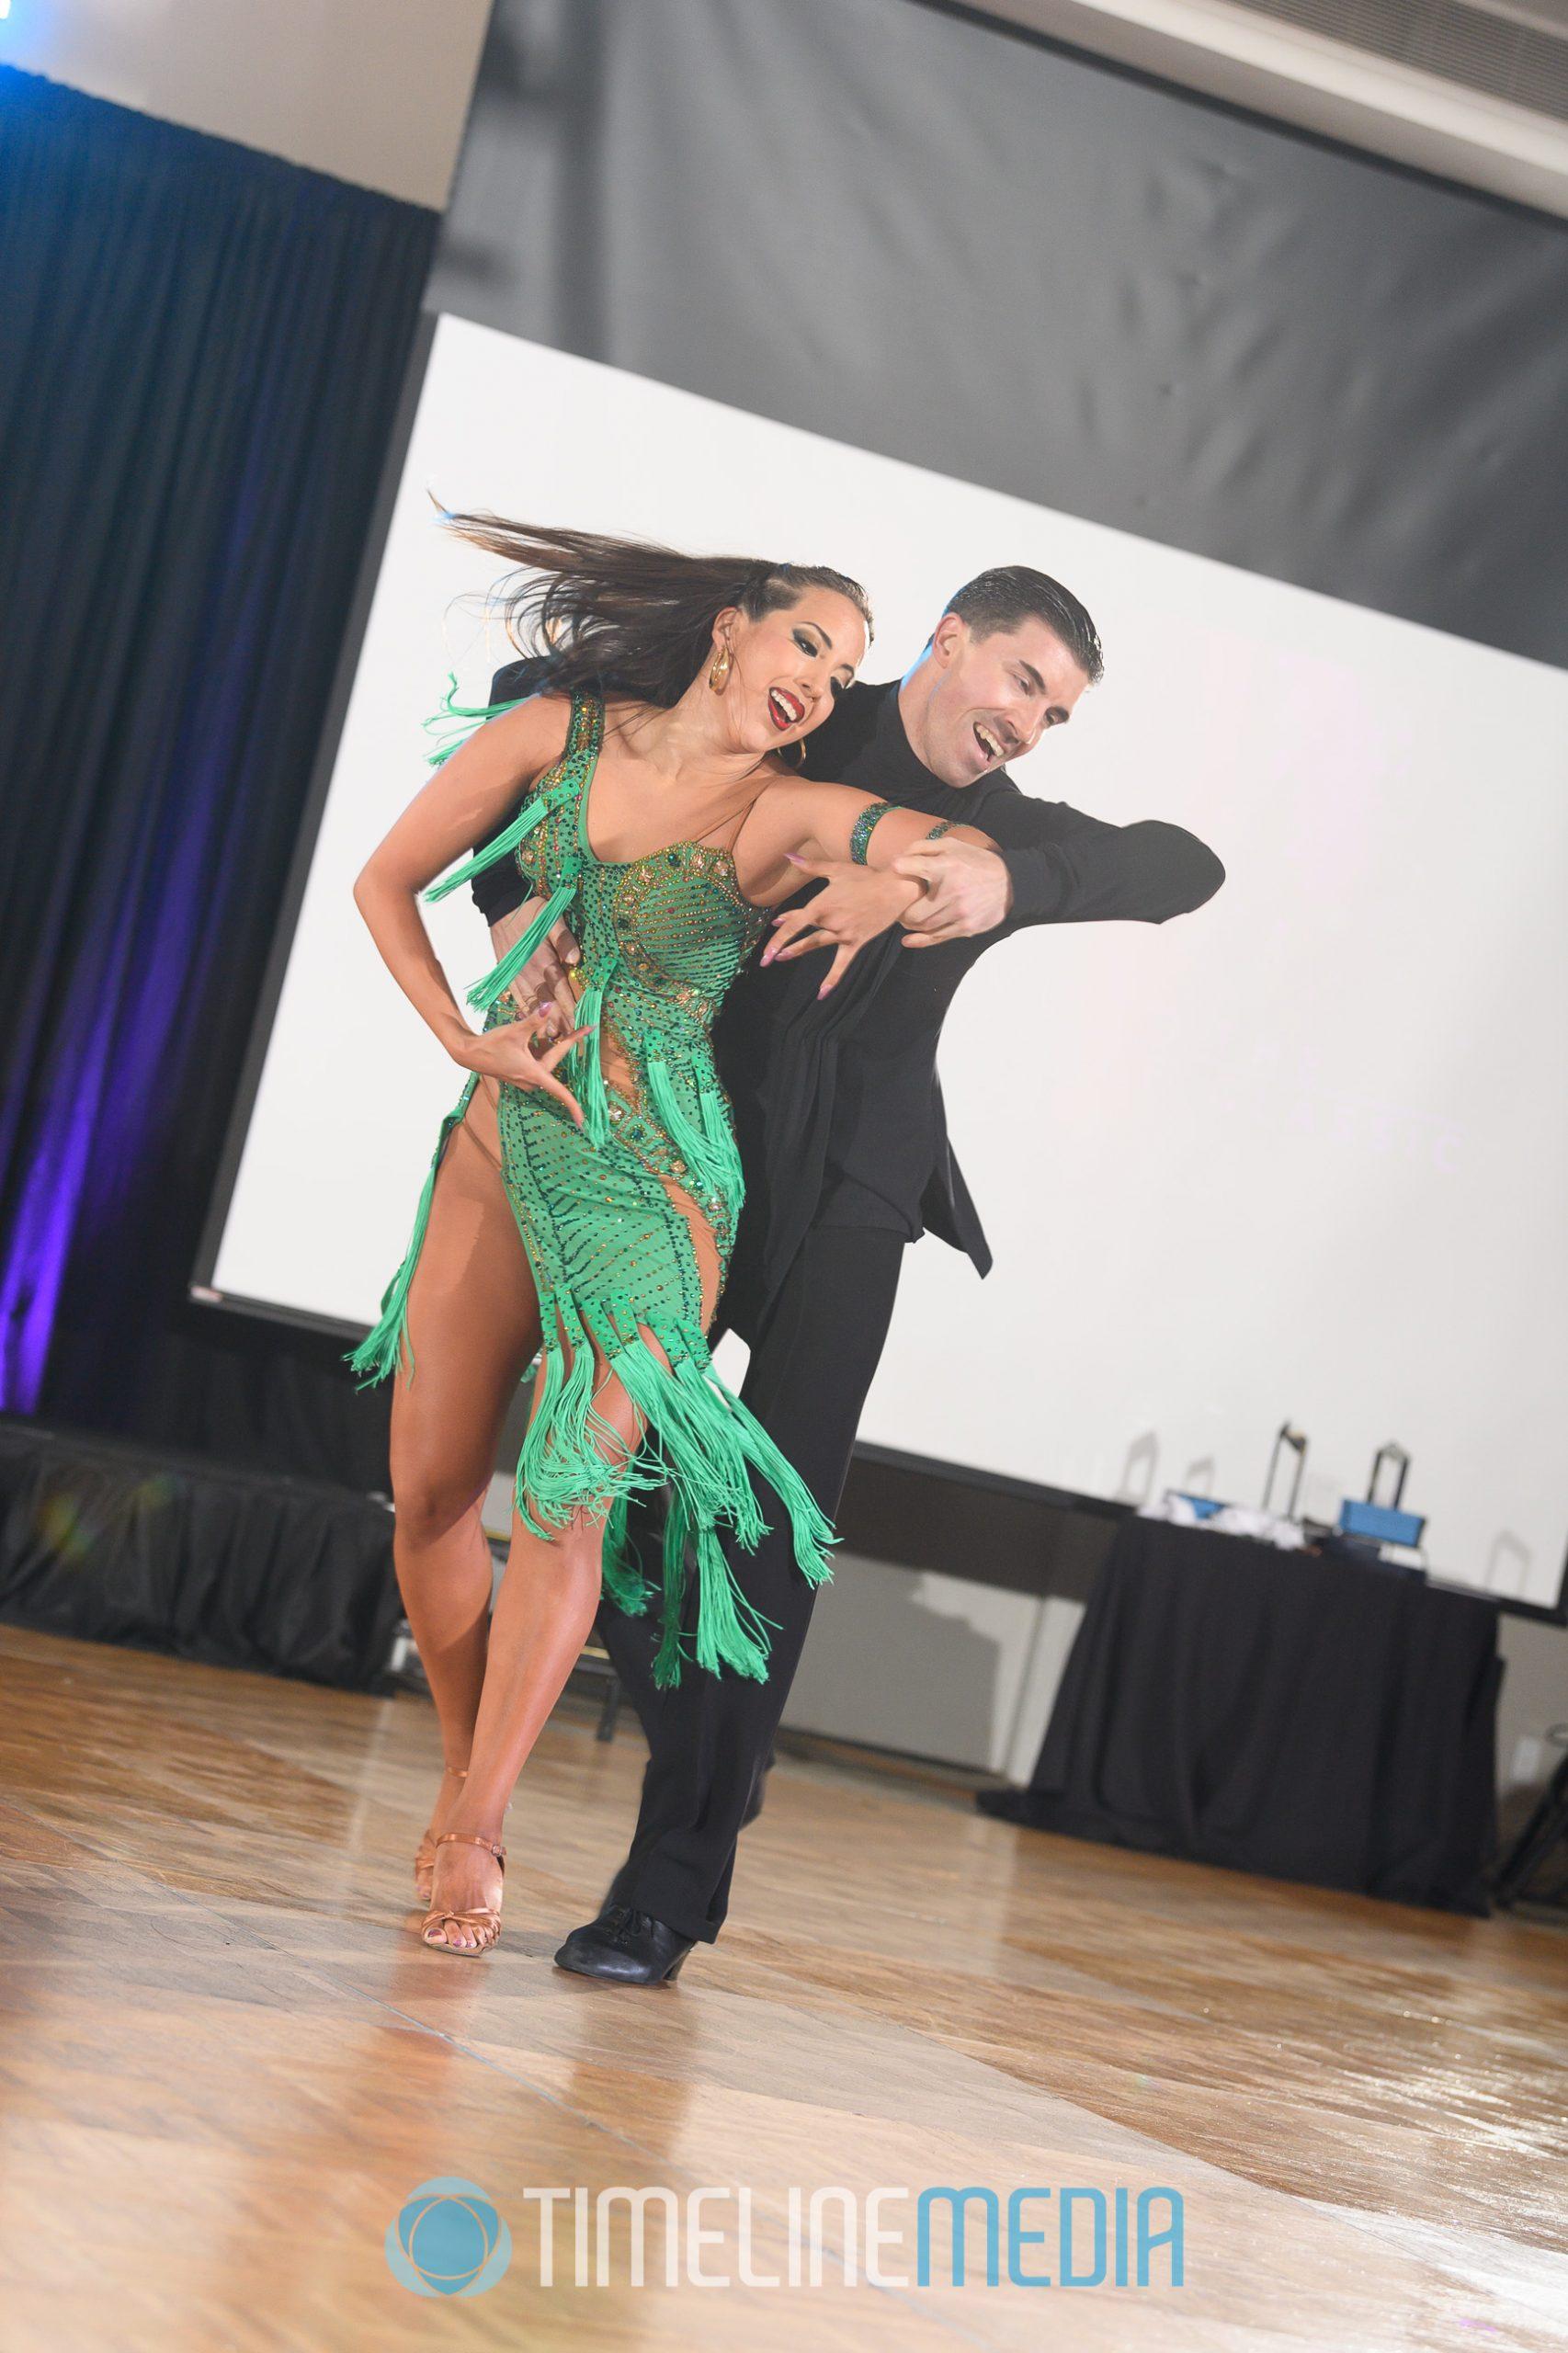 Gabriela Sevillano and Dmitry Solomakha Professional Show ©TimeLine Media